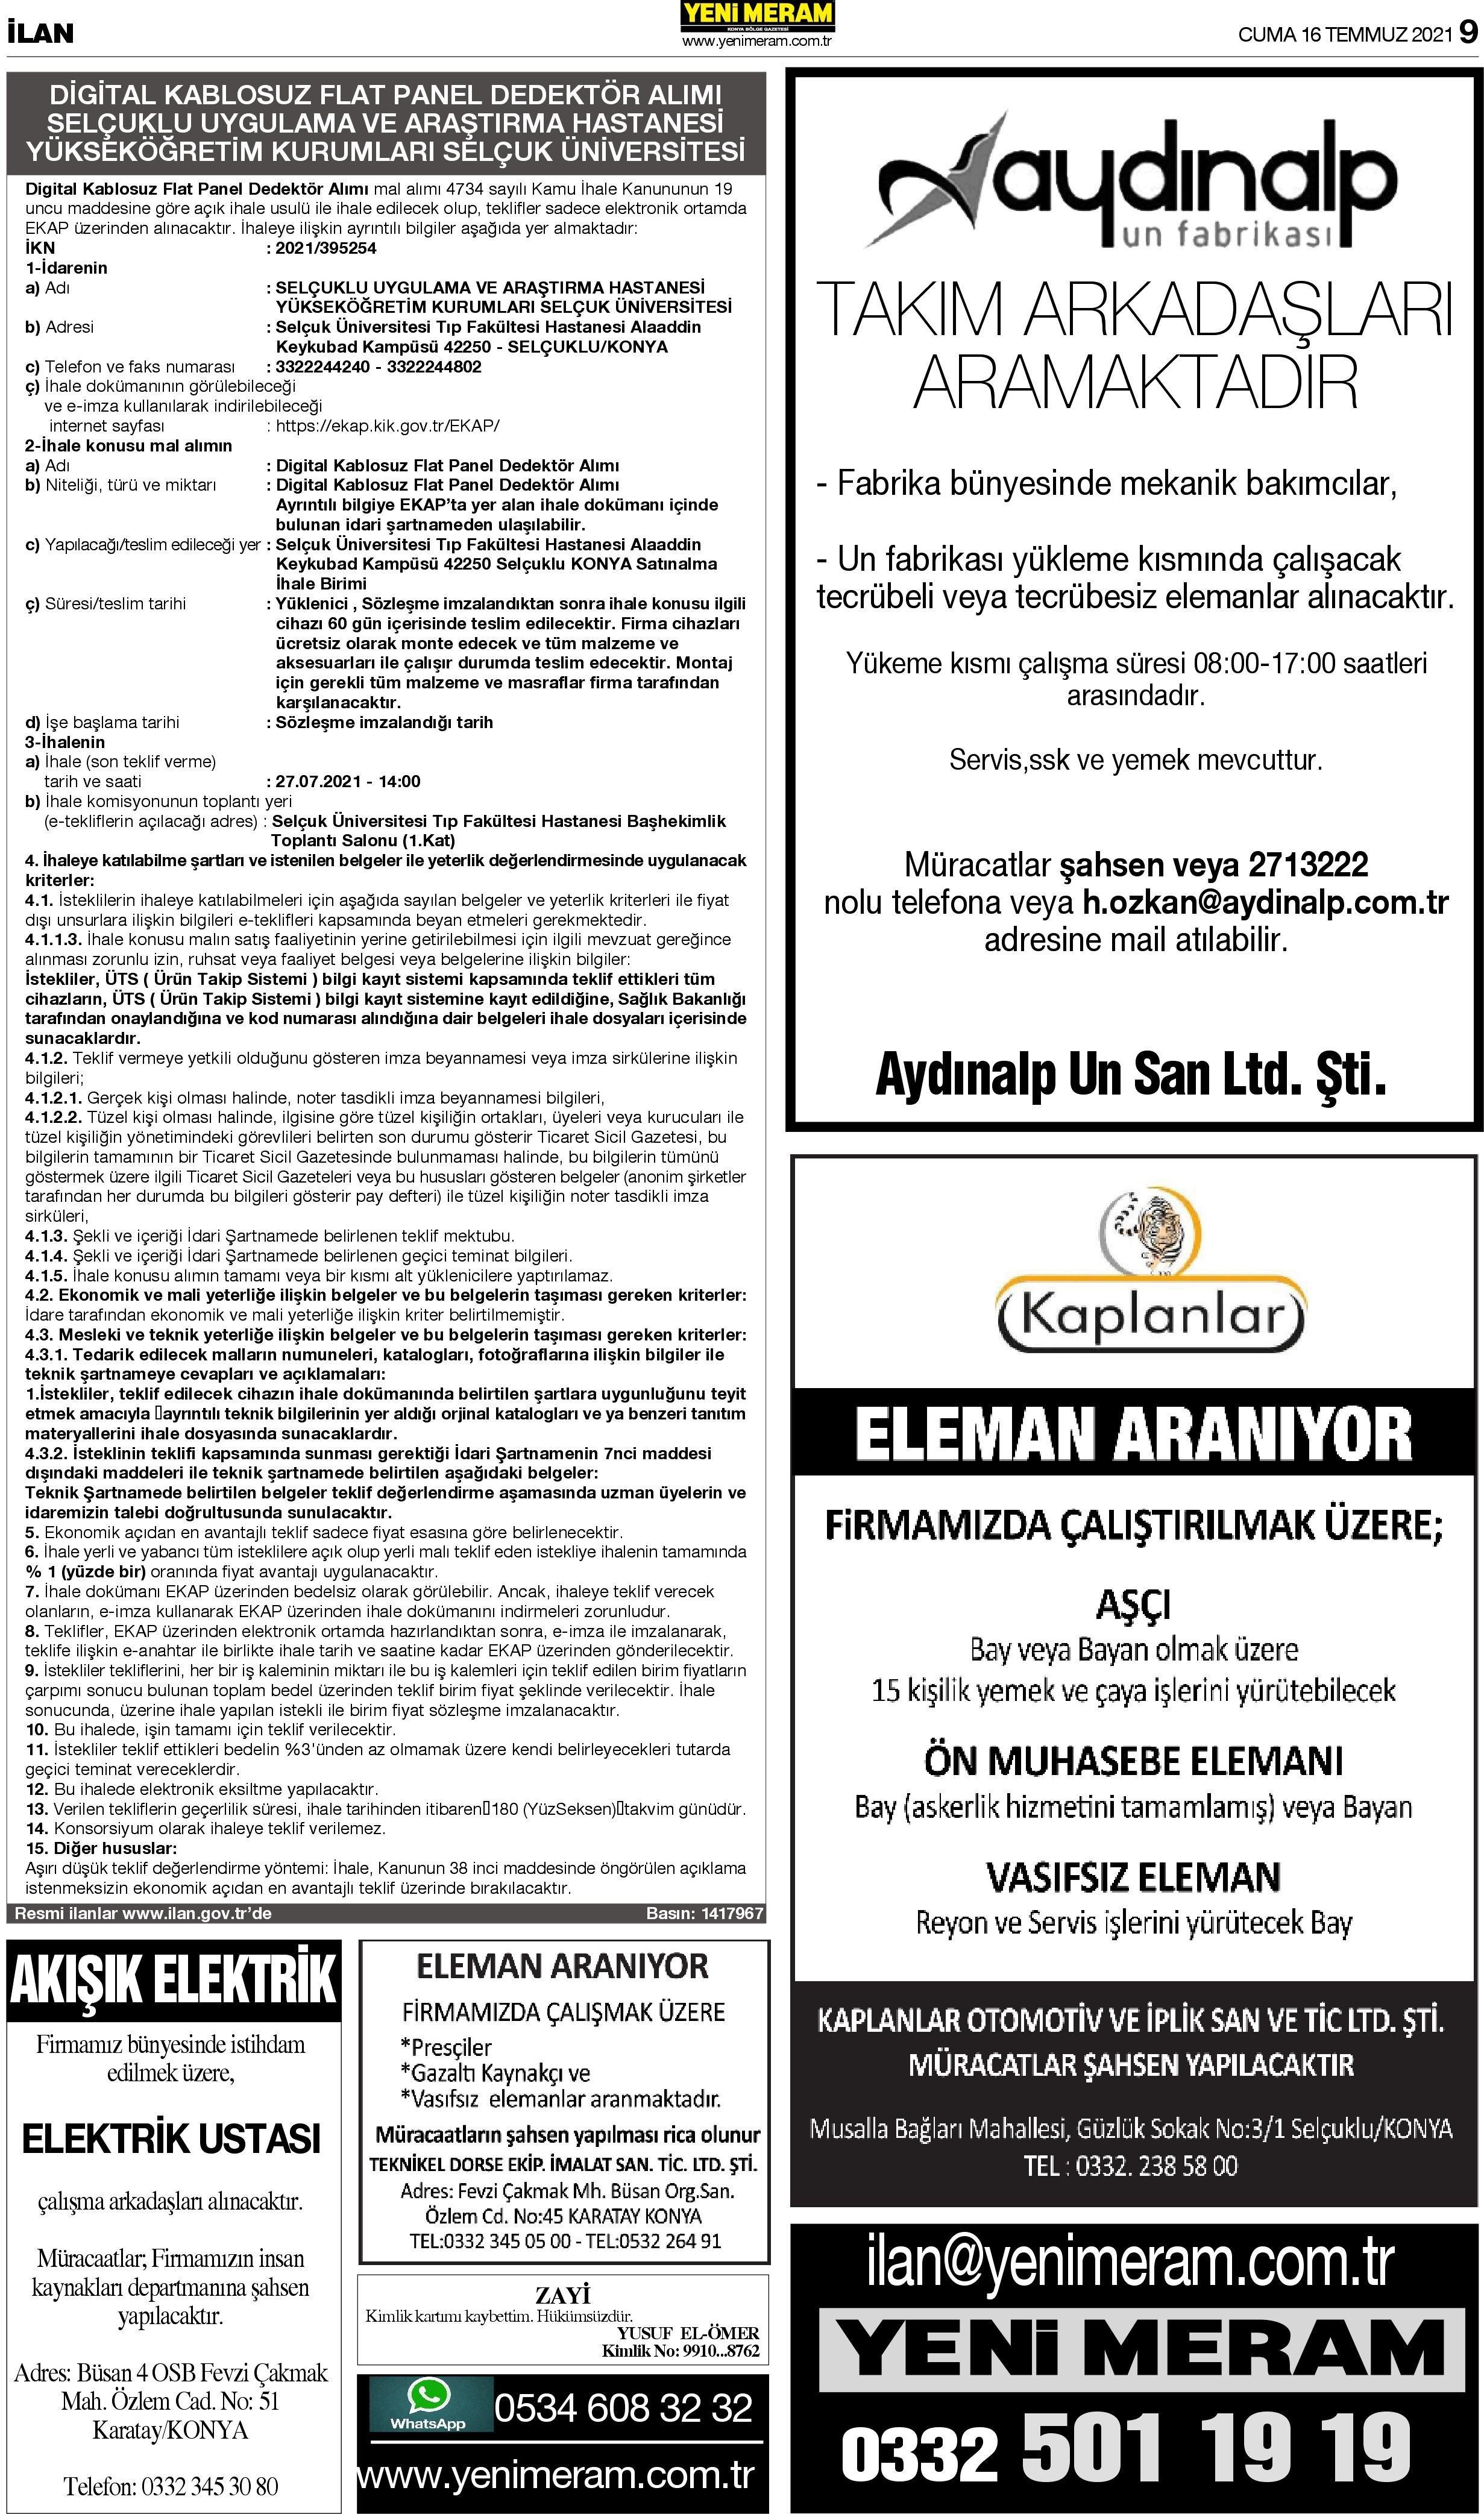 16 Temmuz 2021 Yeni Meram Gazetesi